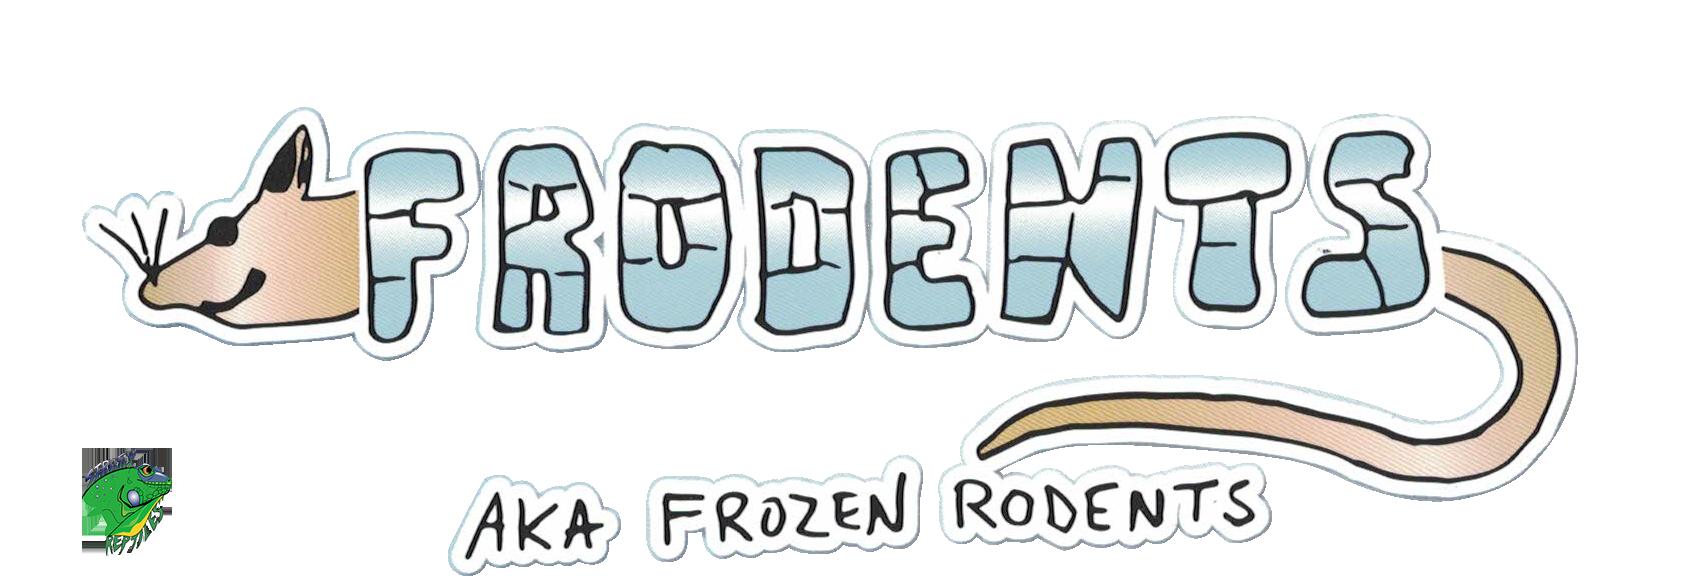 wholesale frozen mice